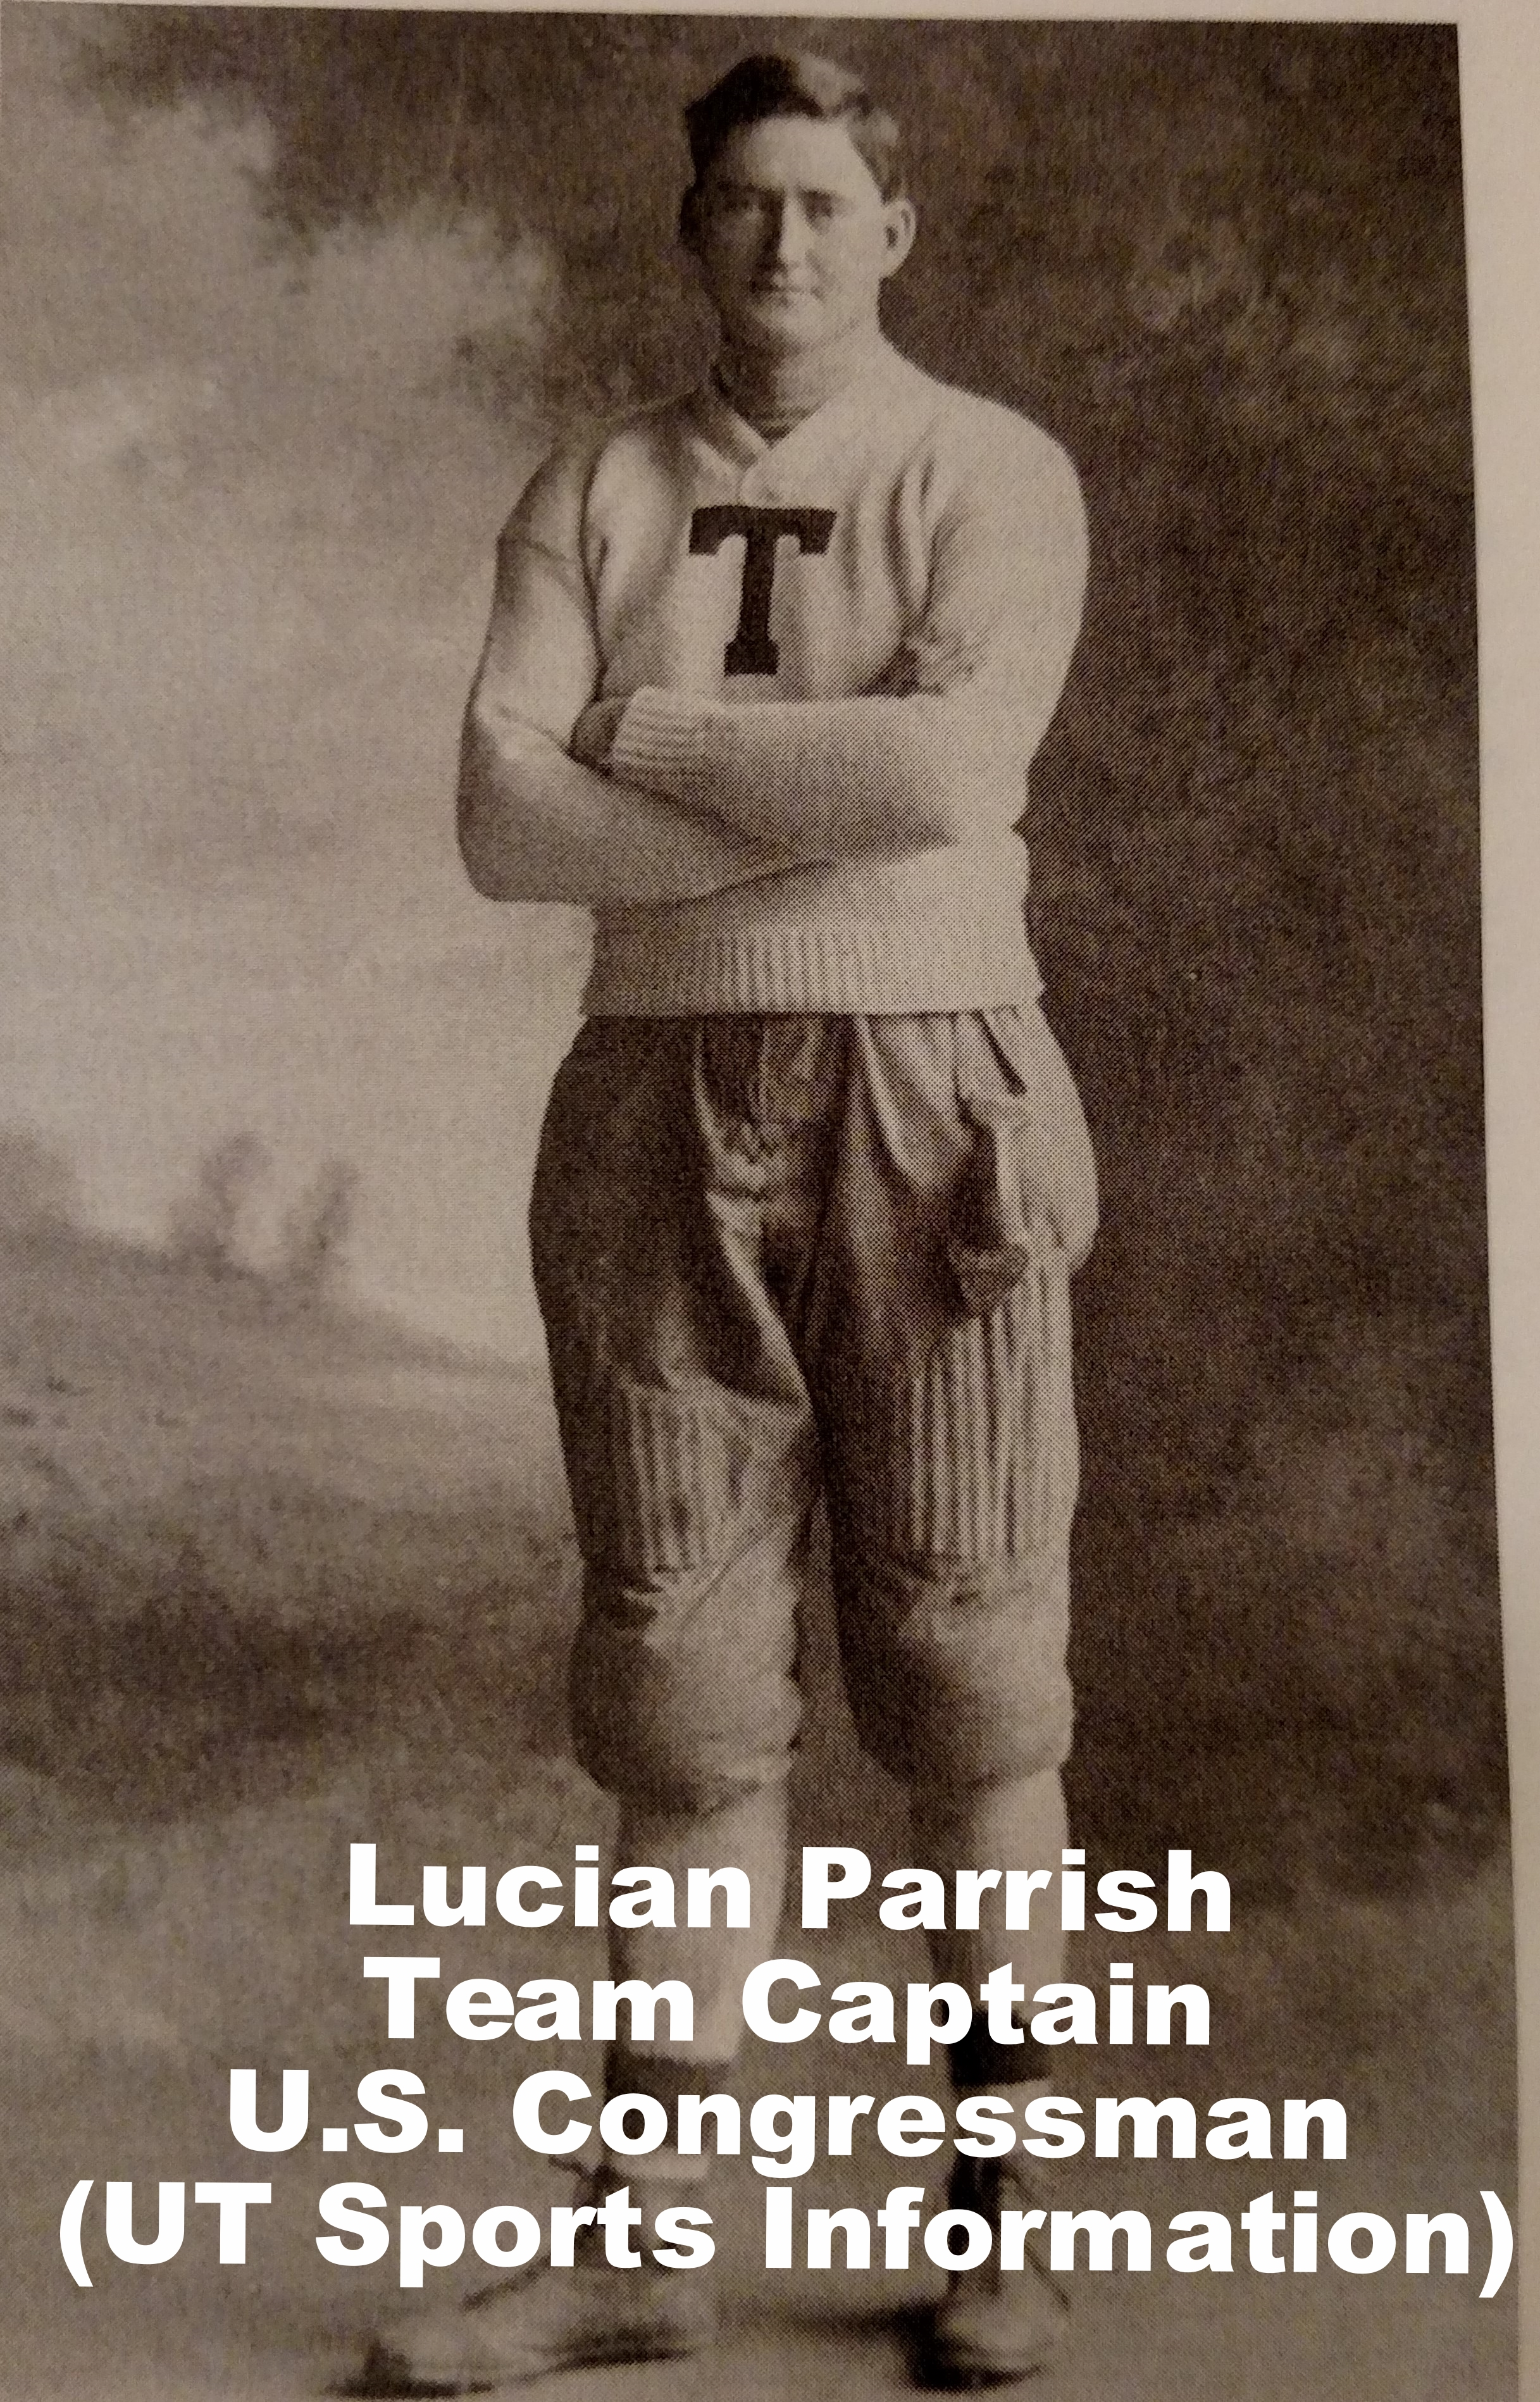 US Congressman Lucian Parrish -Team Captain 1906